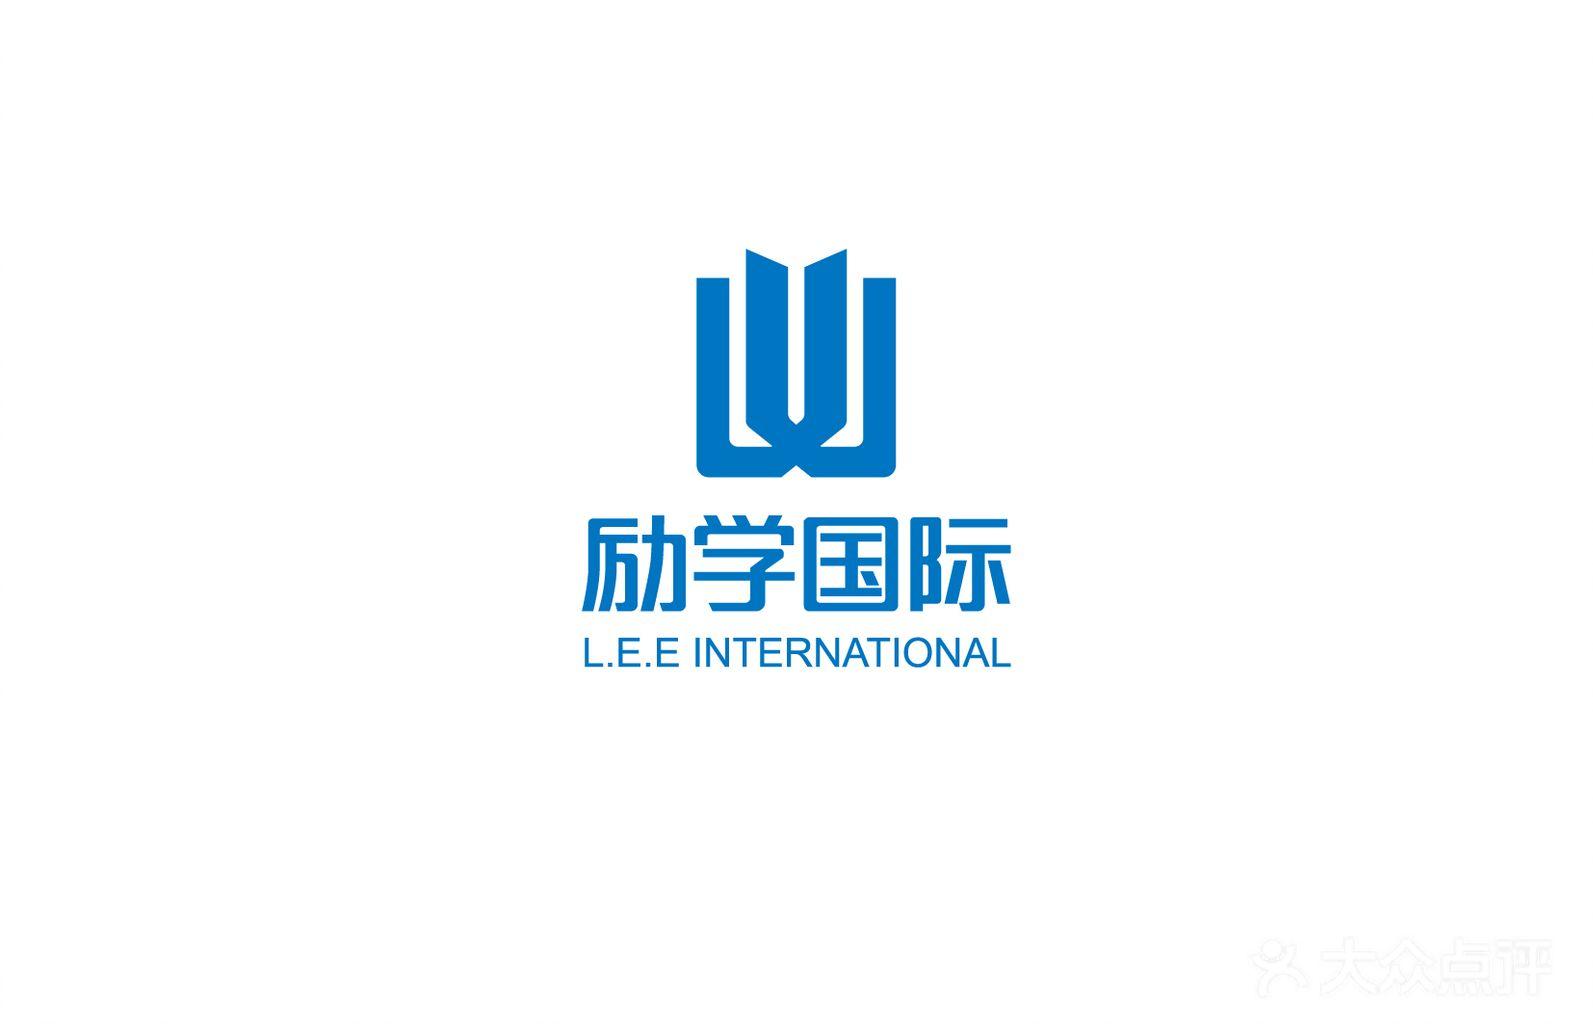 logo logo 标志 设计 图标 1593_1024